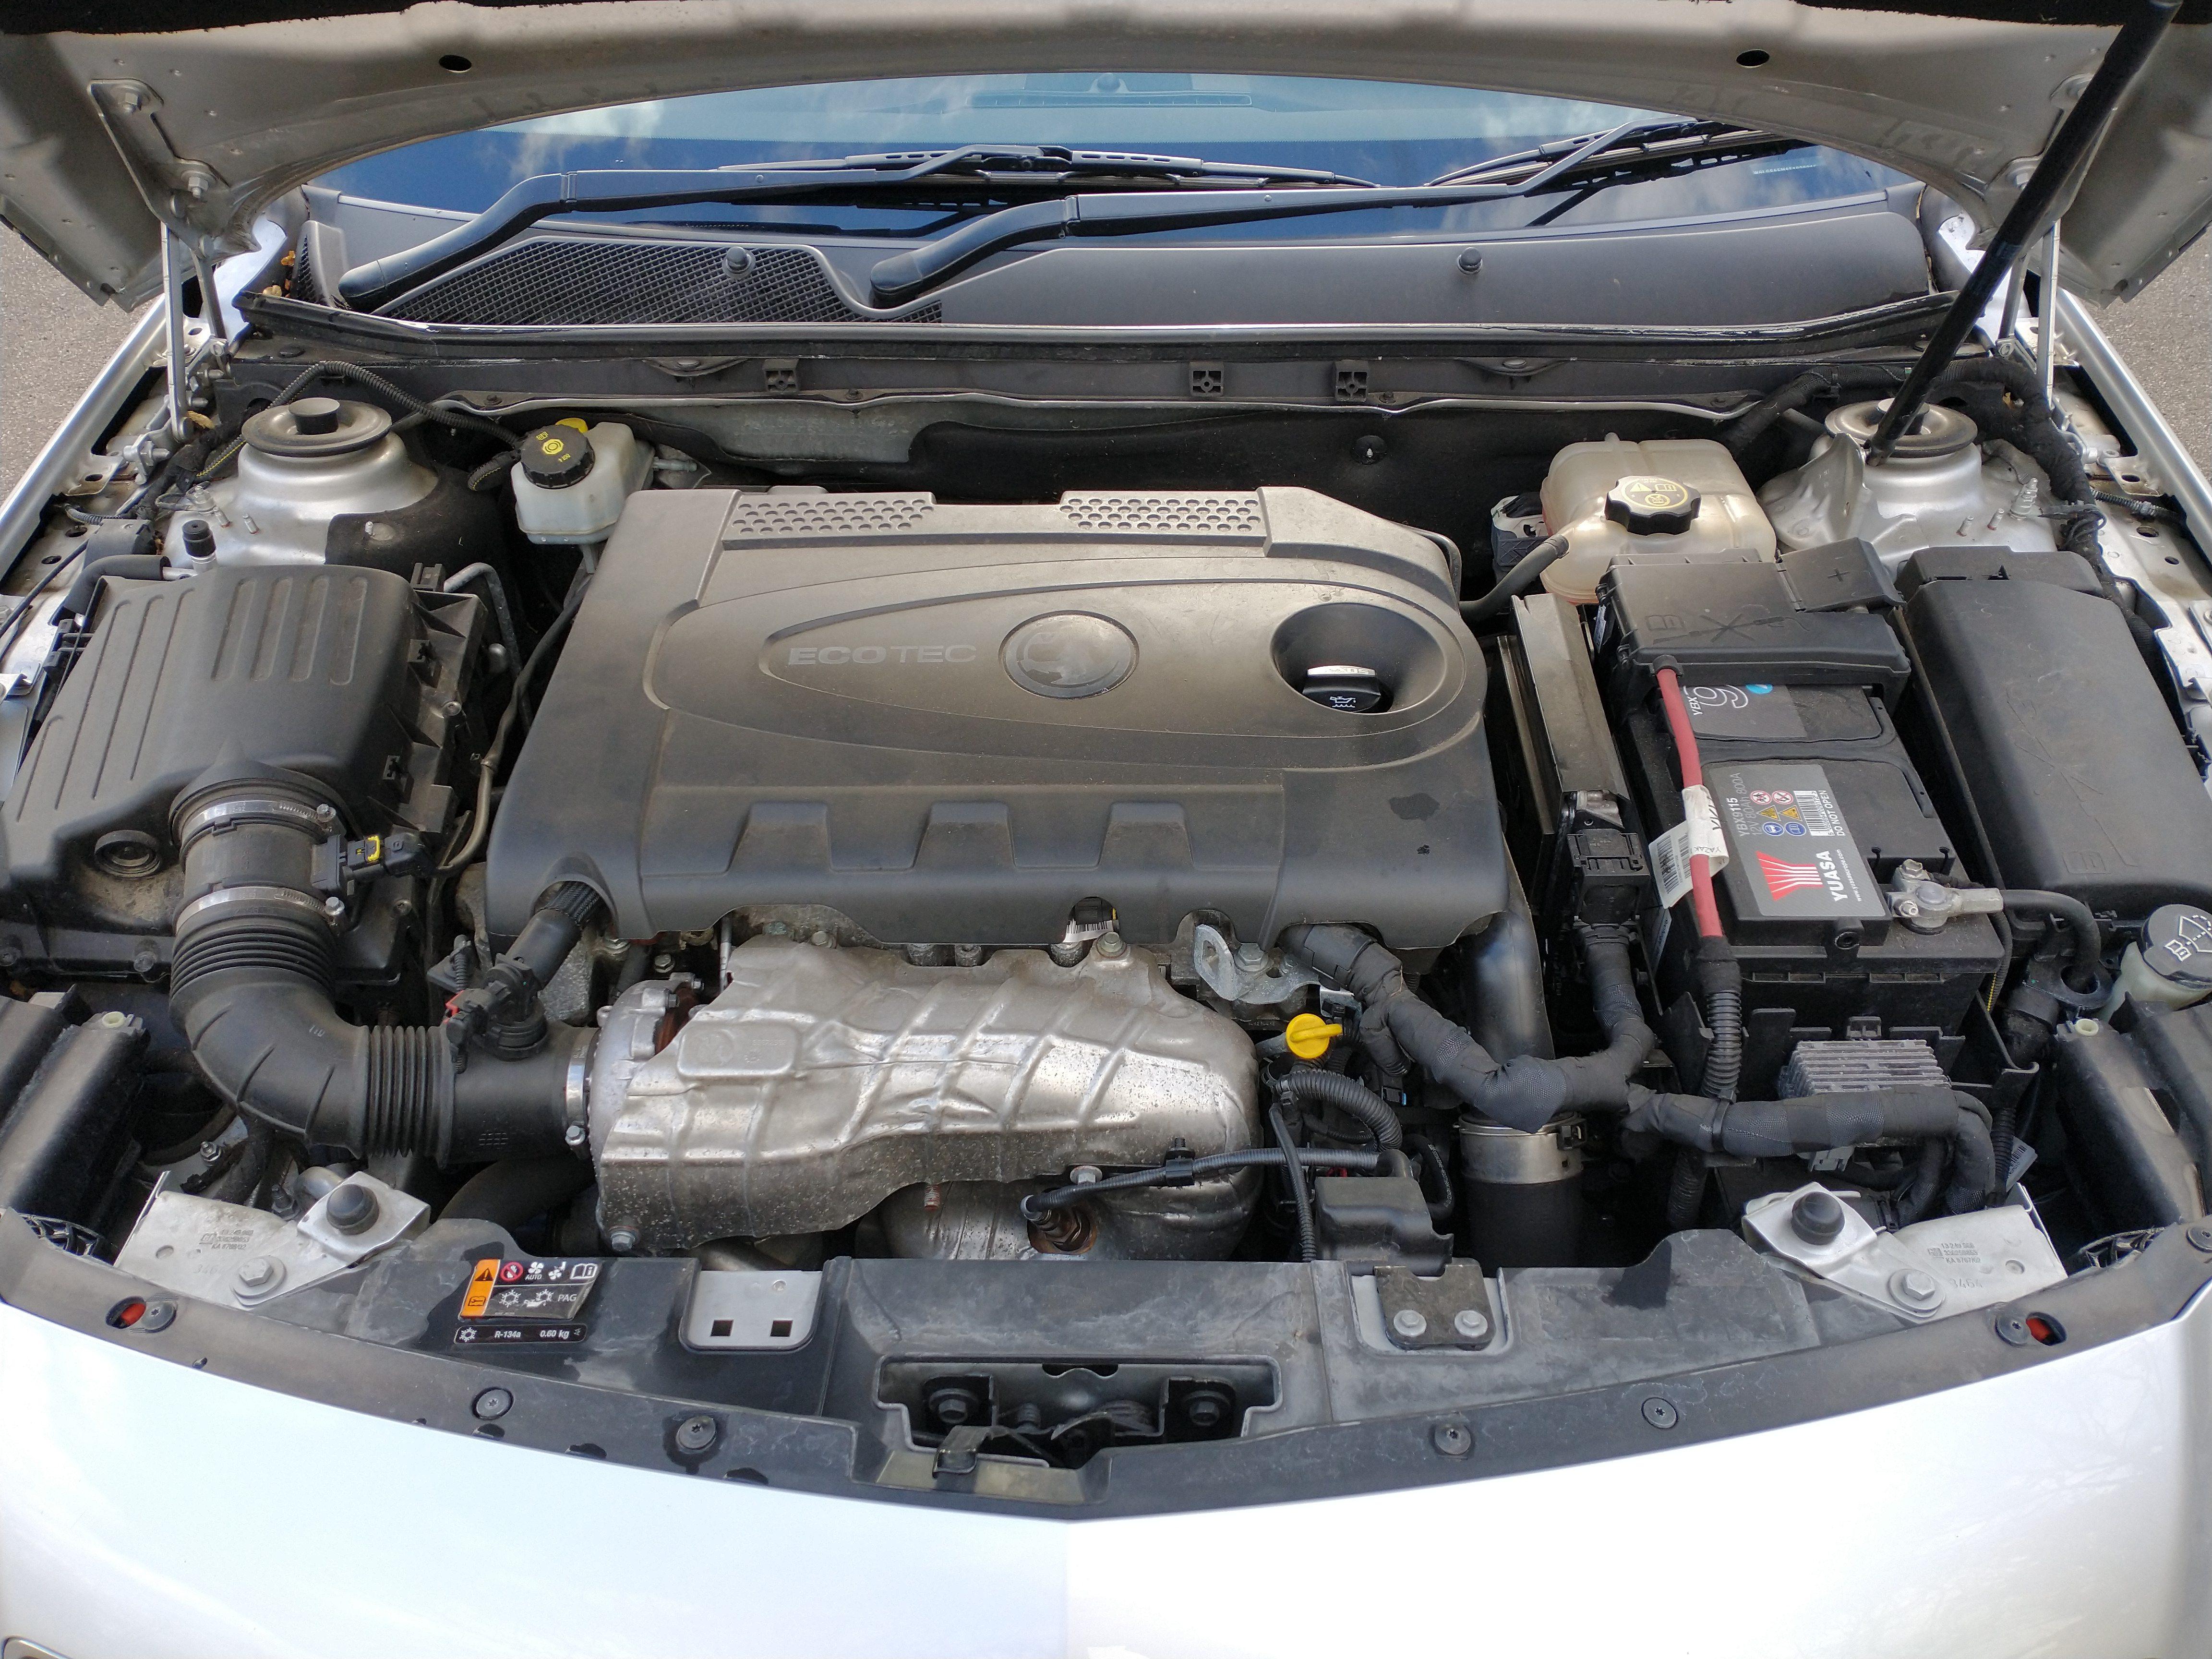 15 plate Vauxhall Insignia 2.0 CDTI 163 SRI 5dr Auto